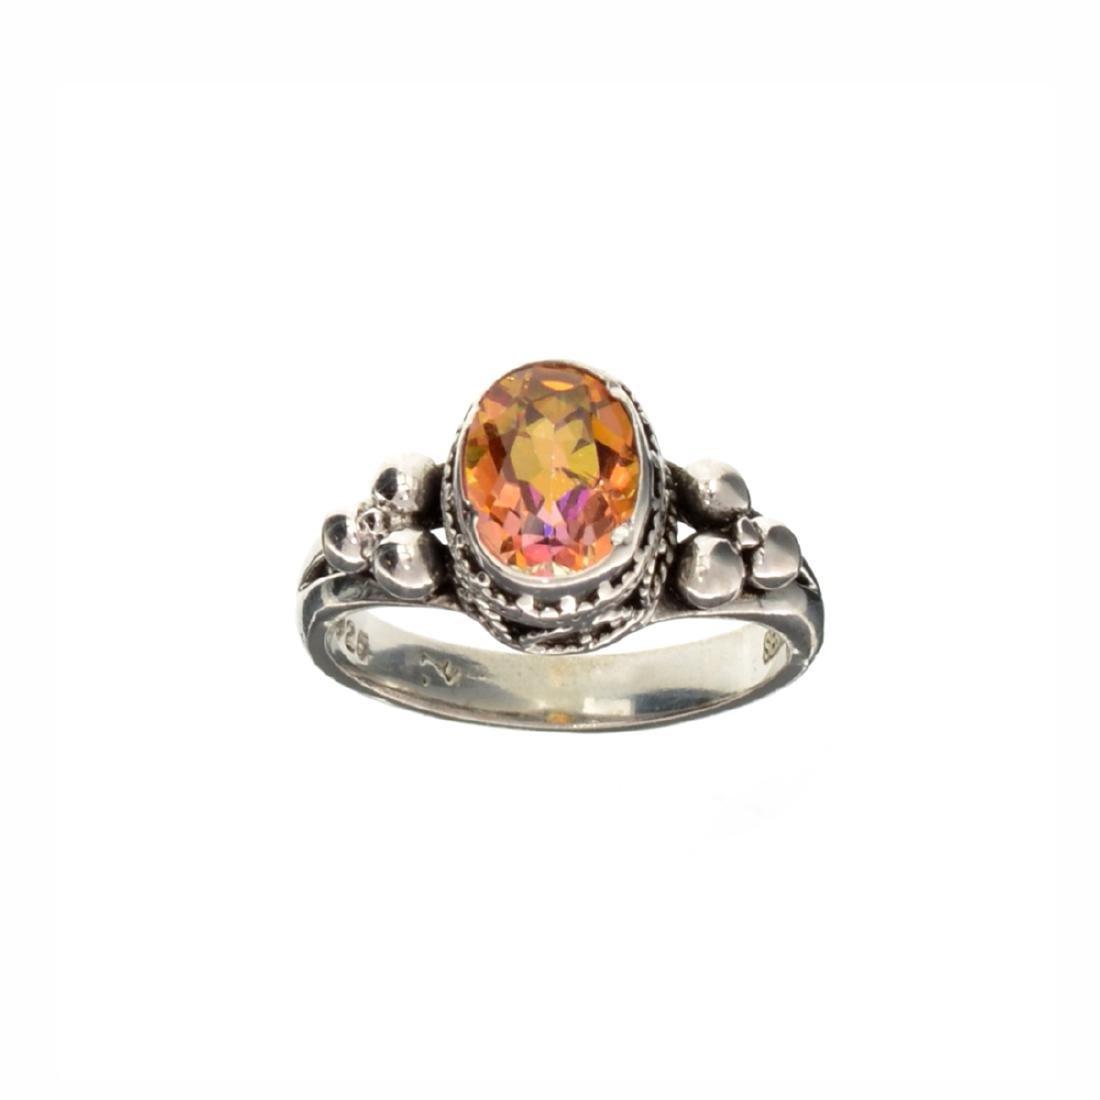 APP: 0.5k Fine Jewelry Designer Sebastian 1.50CT Oval